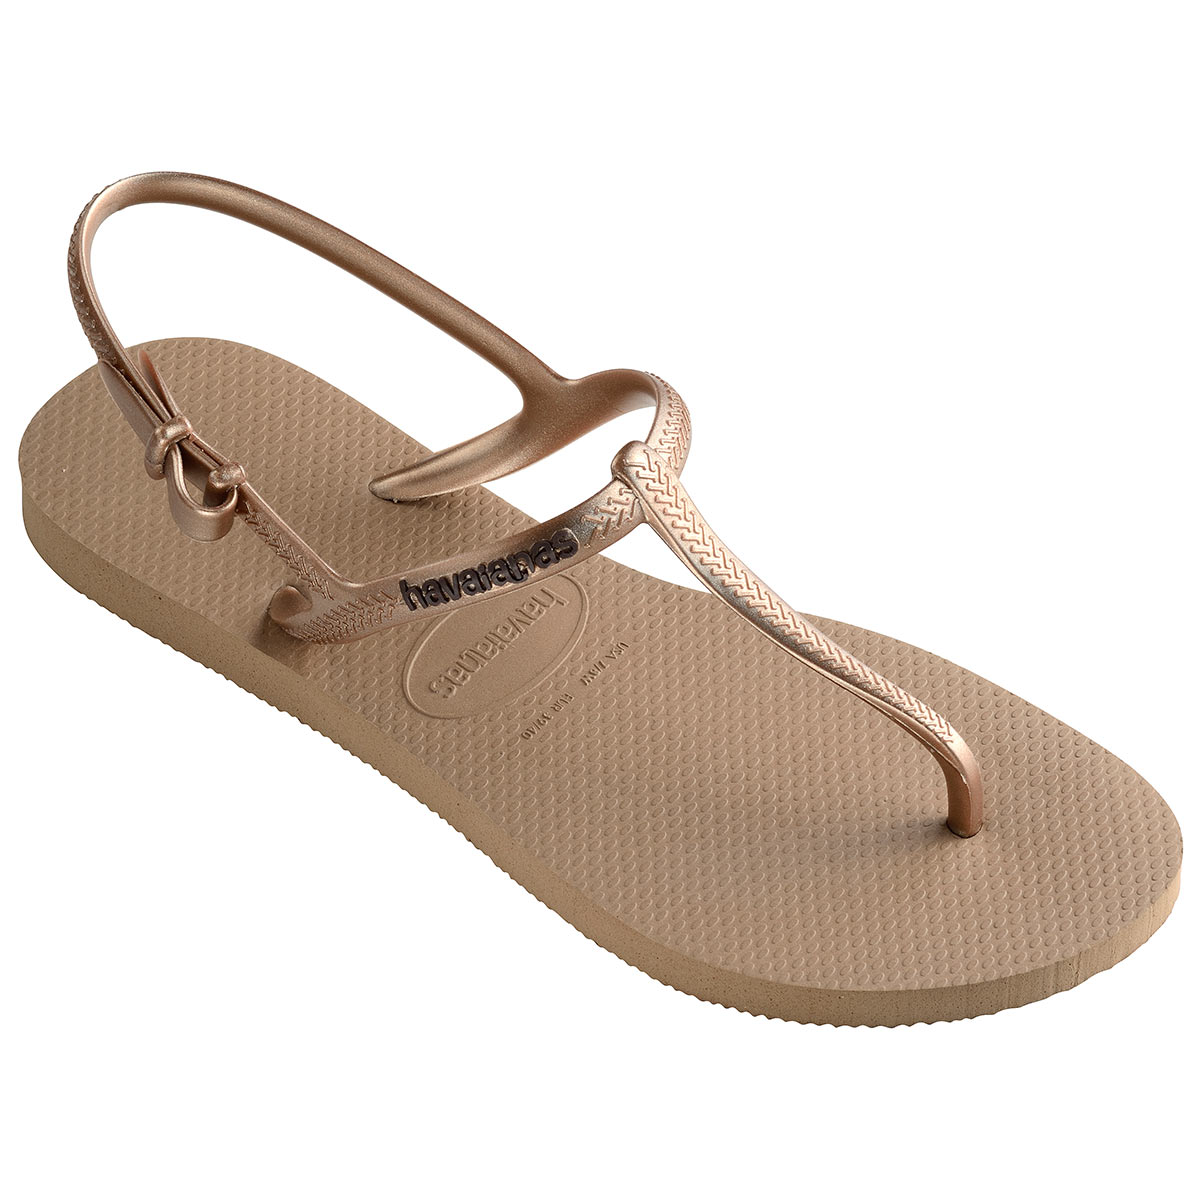 Sandales de plage dorée Freedom